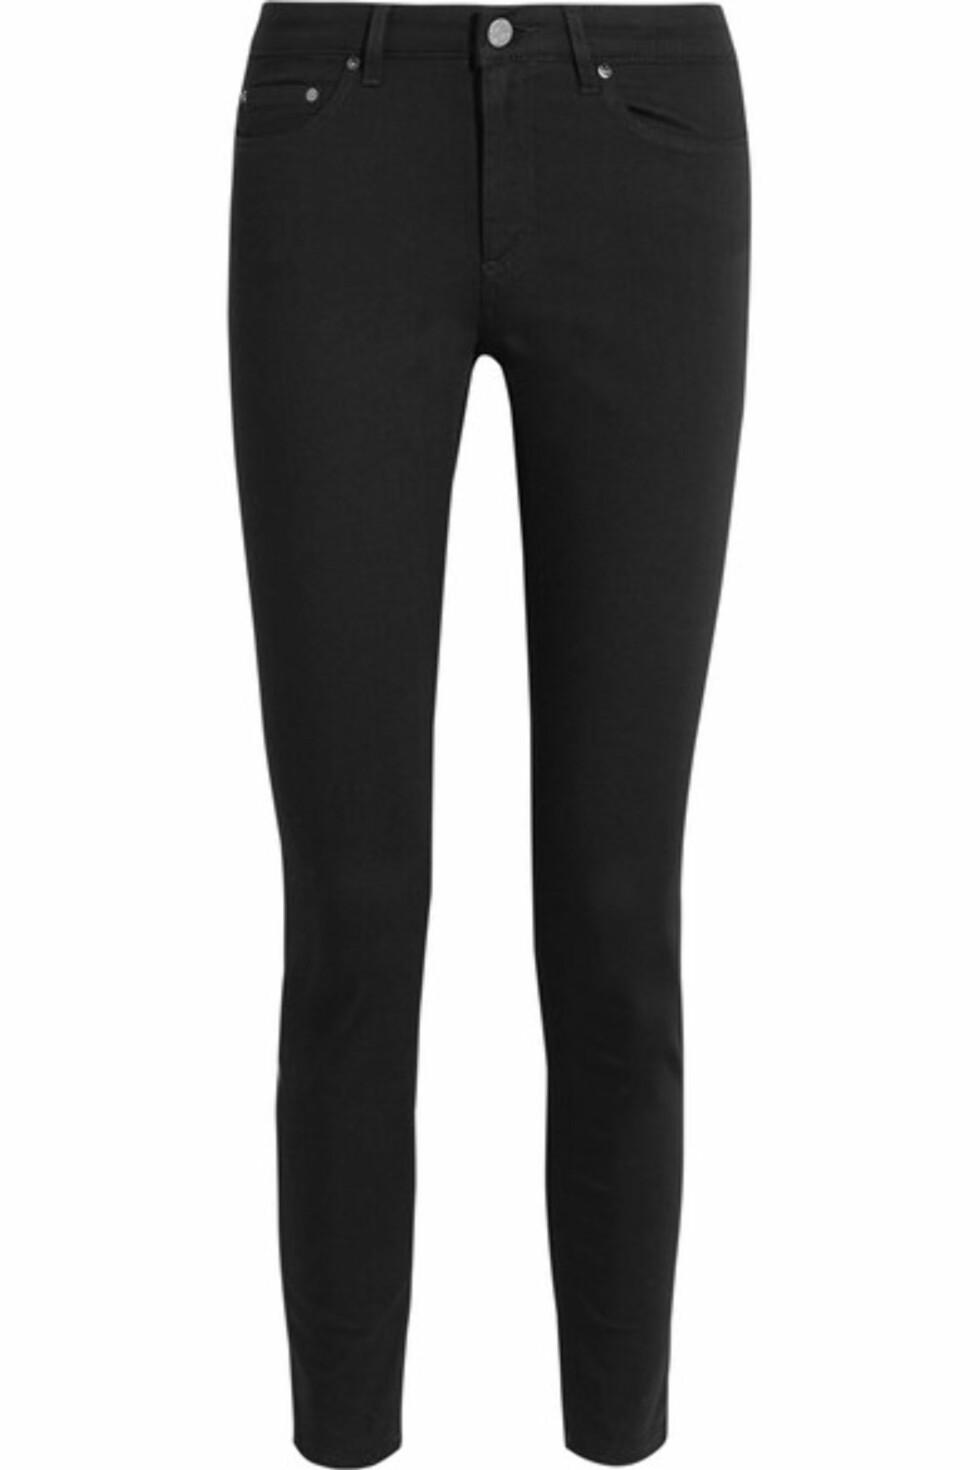 Sorte skinnyjeans fra Net-a-porter.com | kr 1664 | https://www.net-a-porter.com/no/en/product/730770/acne_studios/skin-5-pocket-mid-rise-skinny-jeans